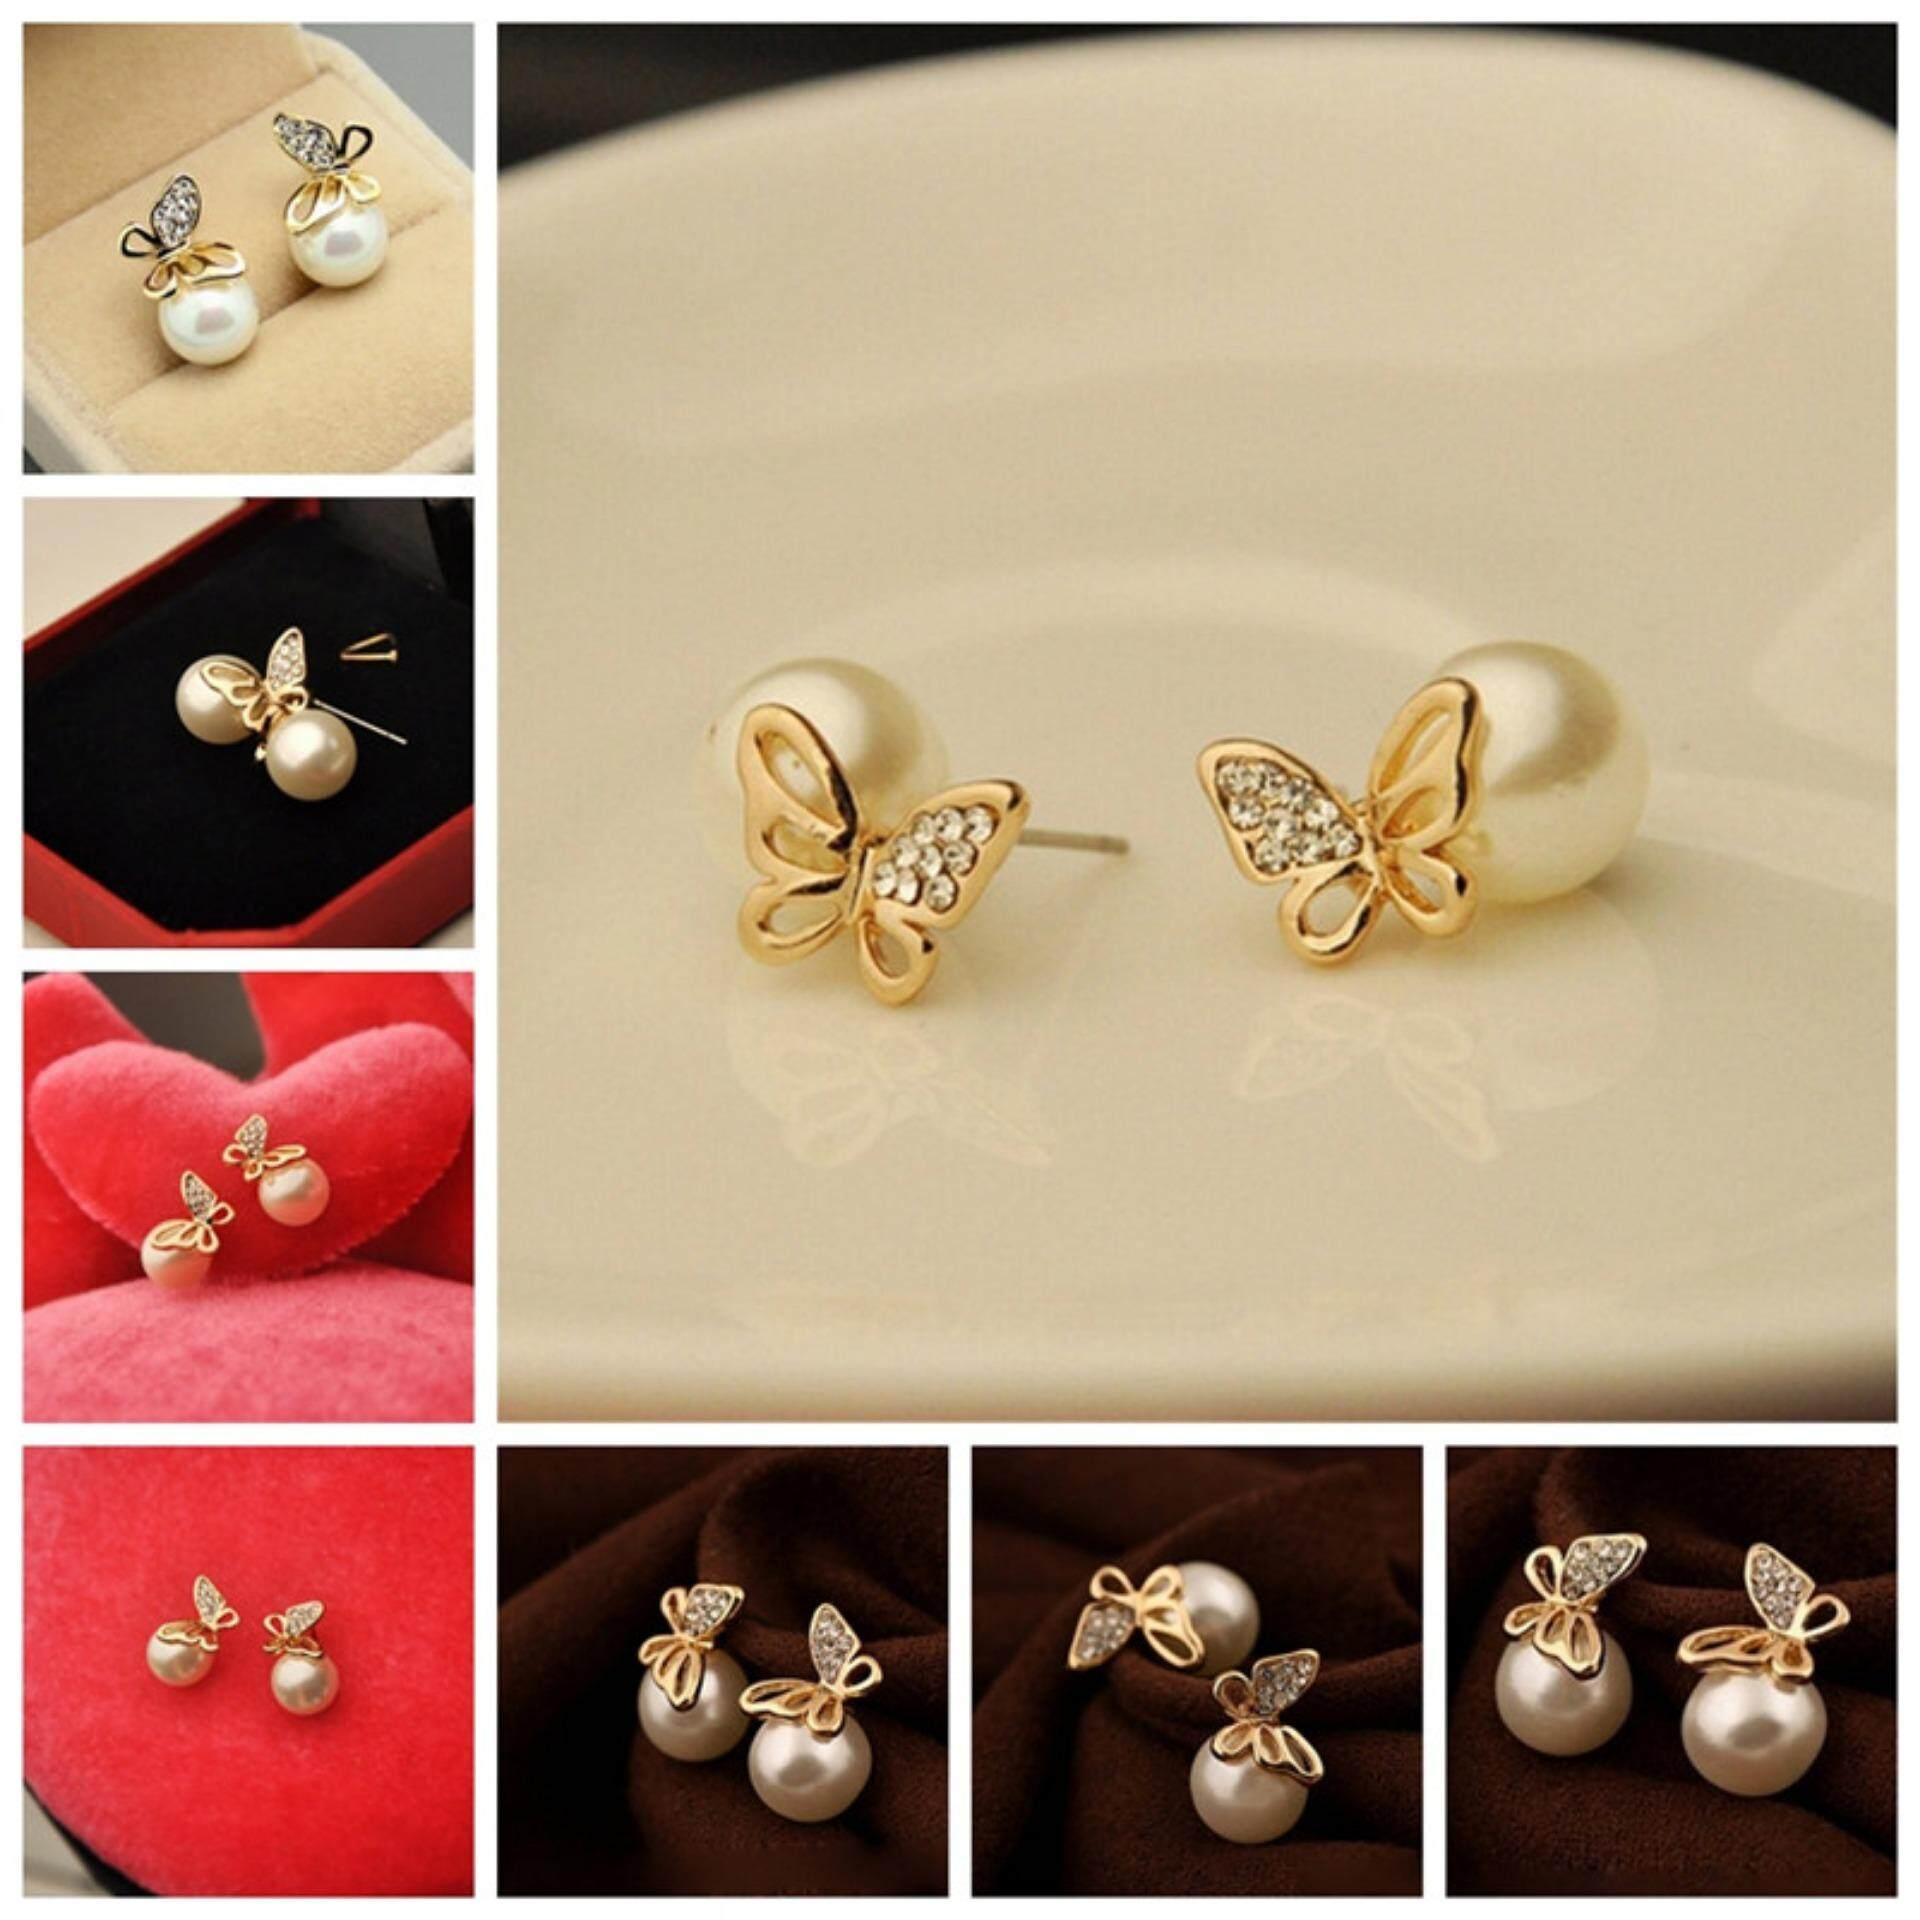 ... Baru Perhiasan Wanita Kristal Gold Mutiara Kupu-kupu Telinga Kado Anting -anting Permata- ...